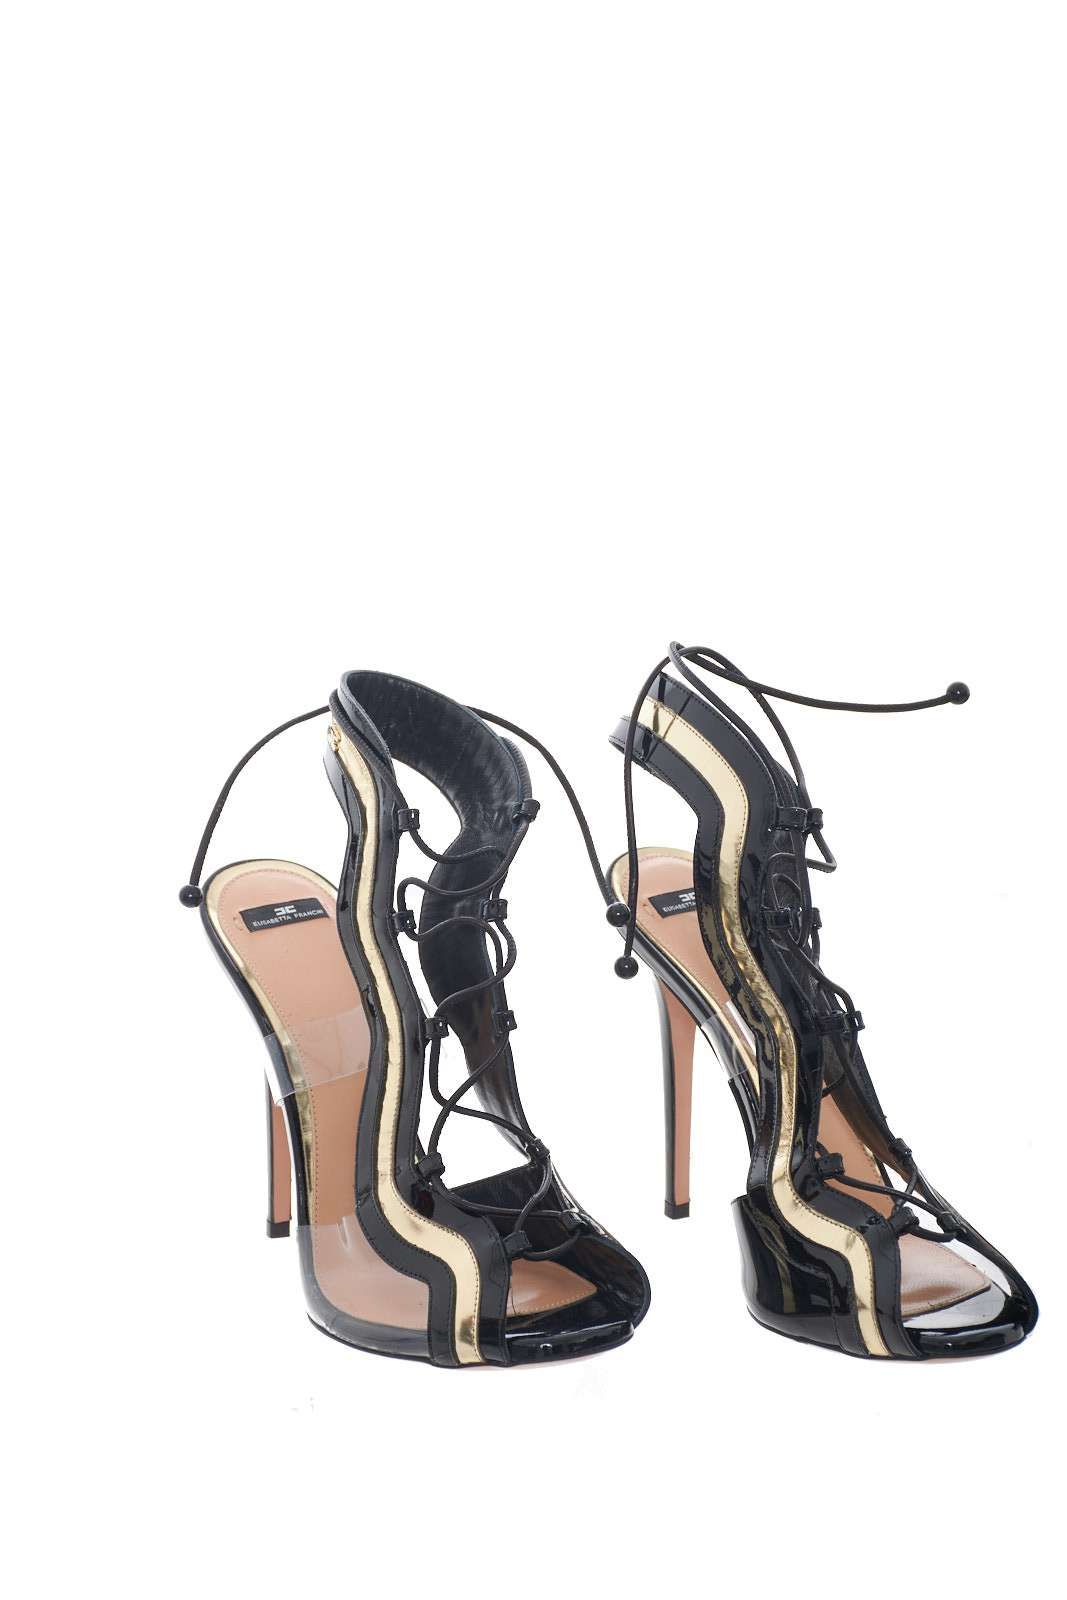 https://www.parmax.com/media/catalog/product/a/i/PE-outlet_parmax-scarpe-donna-Elisabetta-Franchi-SA36S92E2-D.jpg